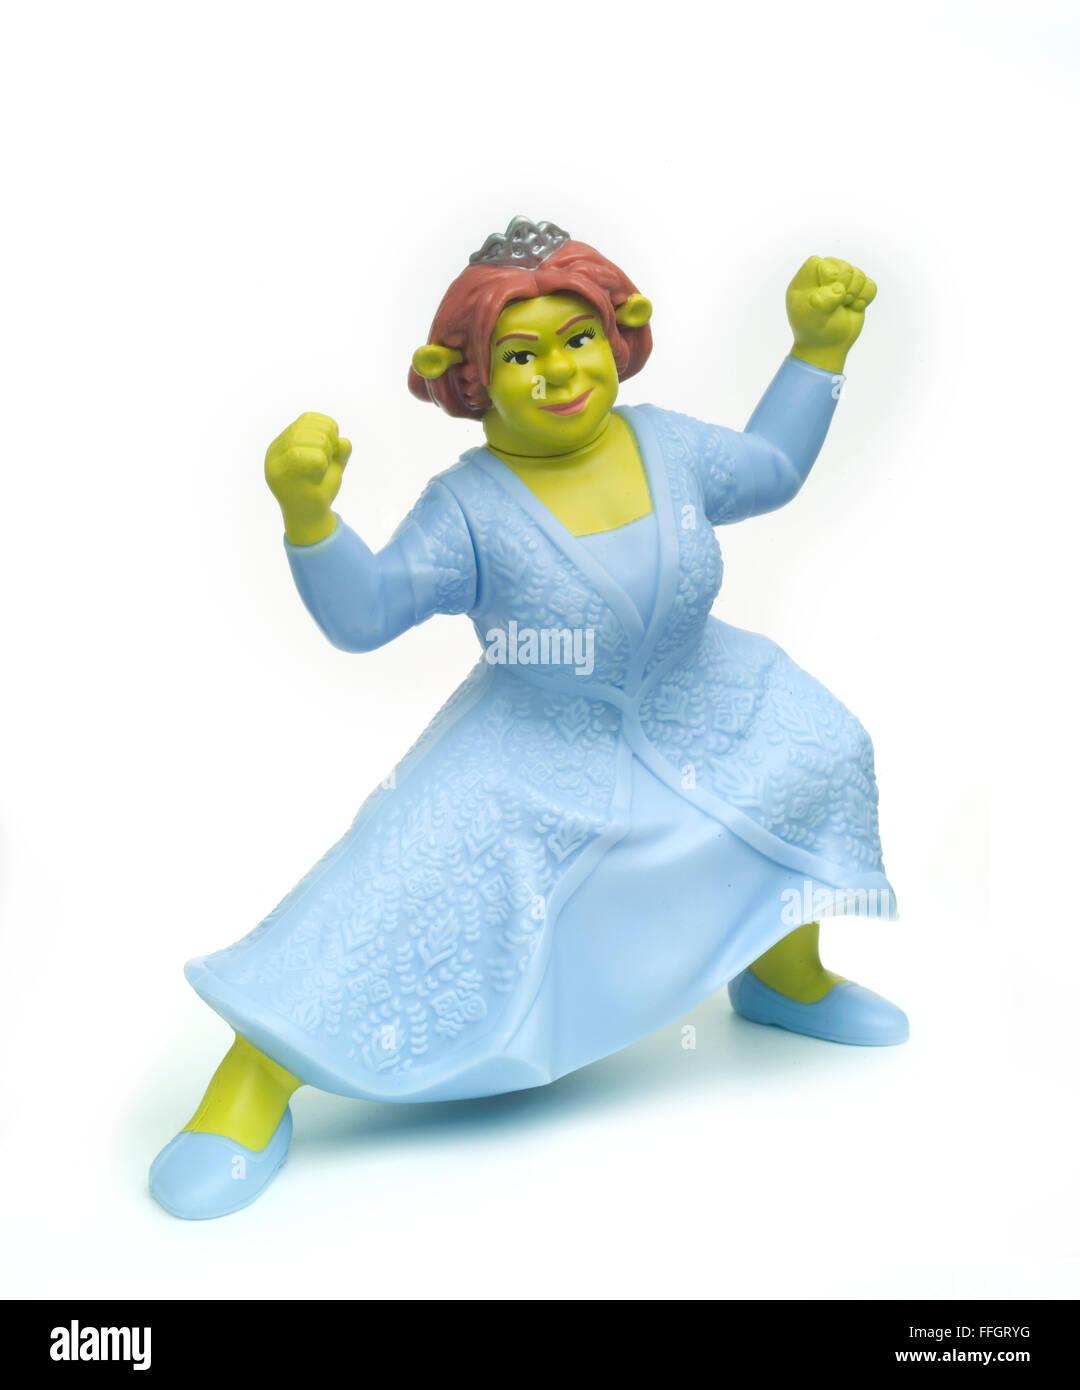 Shrek And Fiona Stock Photos & Shrek And Fiona Stock Images - Alamy